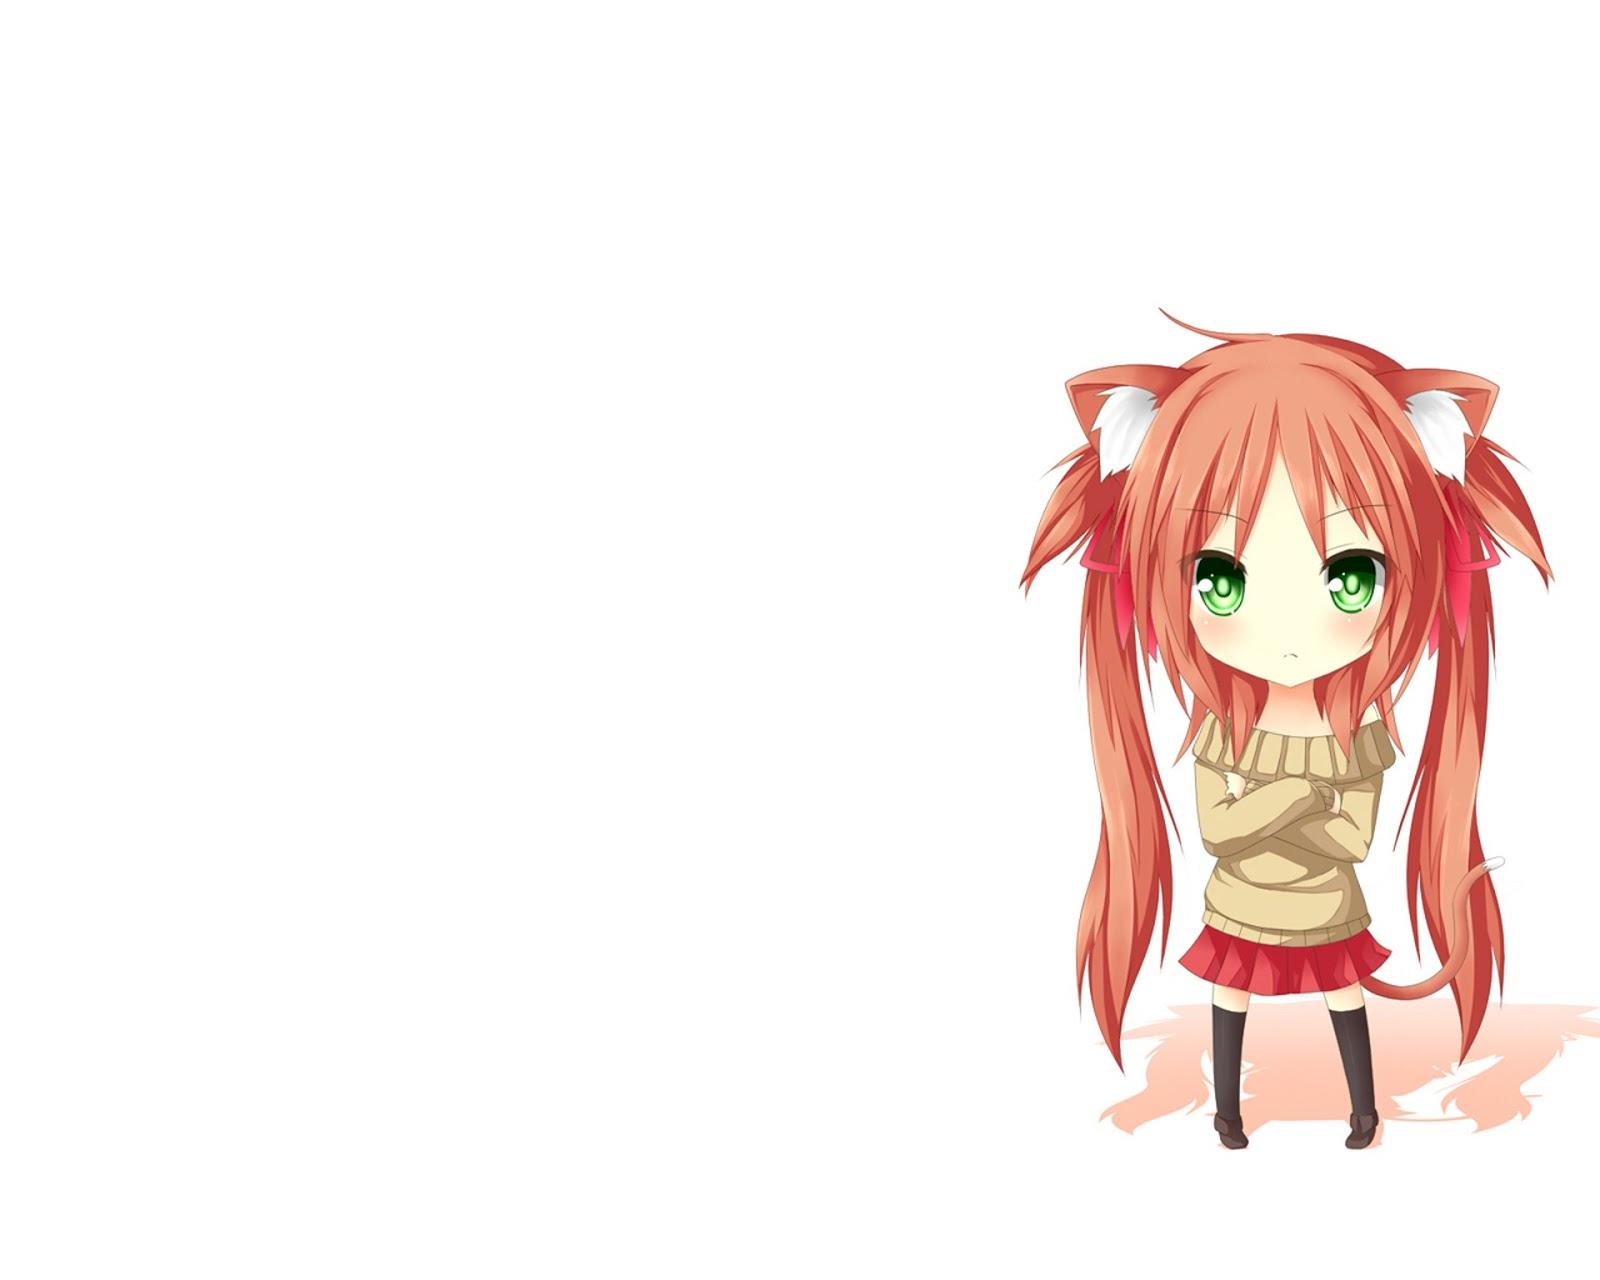 Chibi vocaloid for desktop wallpaper cute png file - Chibi background ...